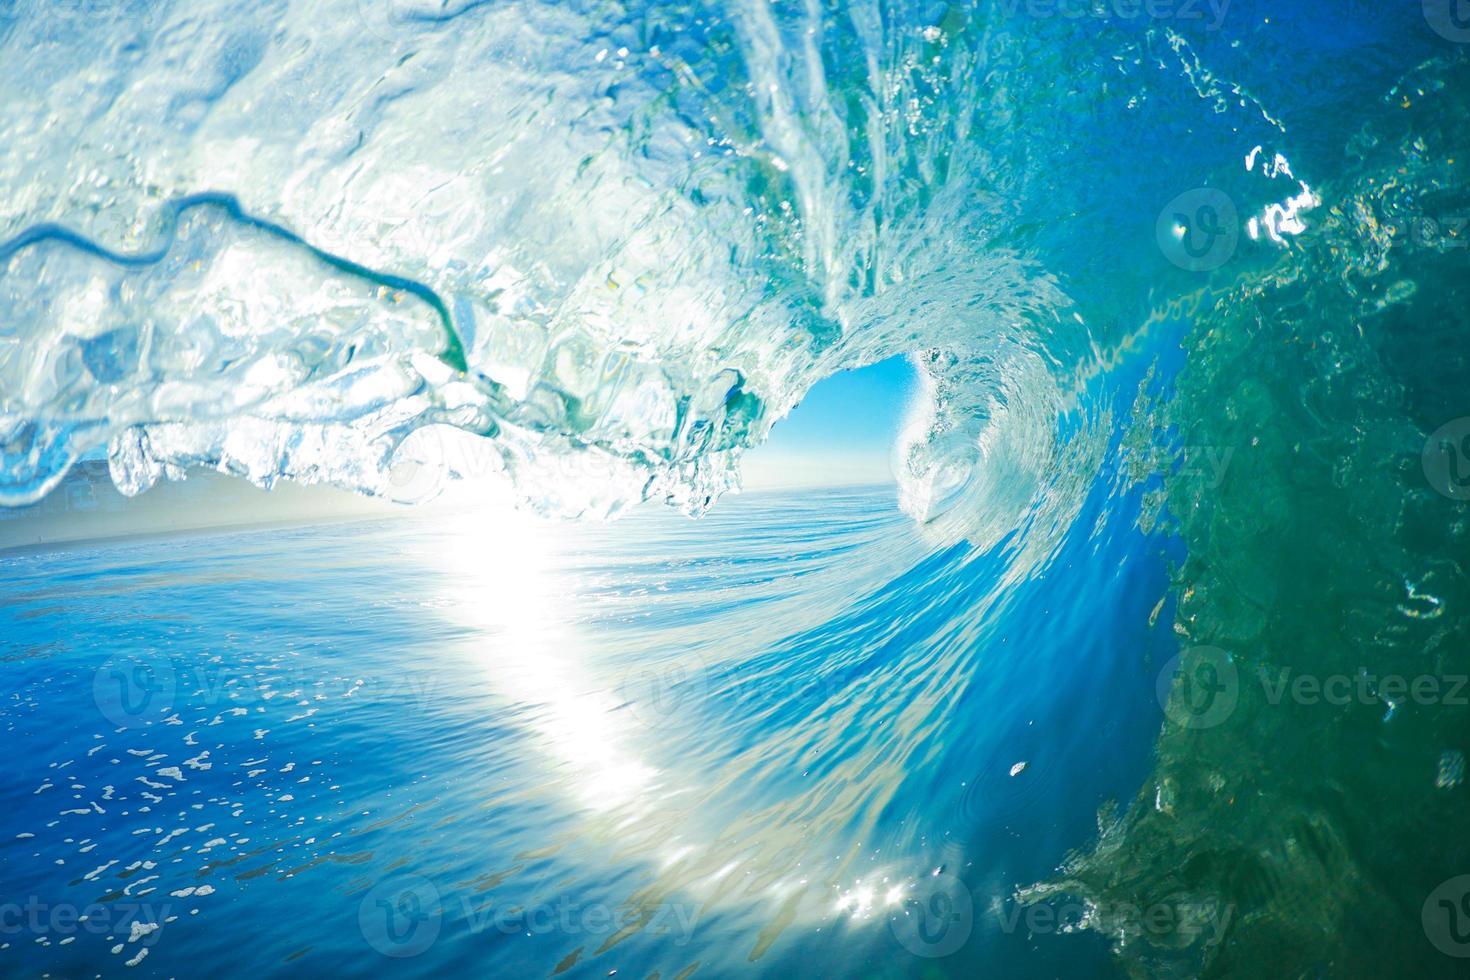 onda dell'oceano blu foto